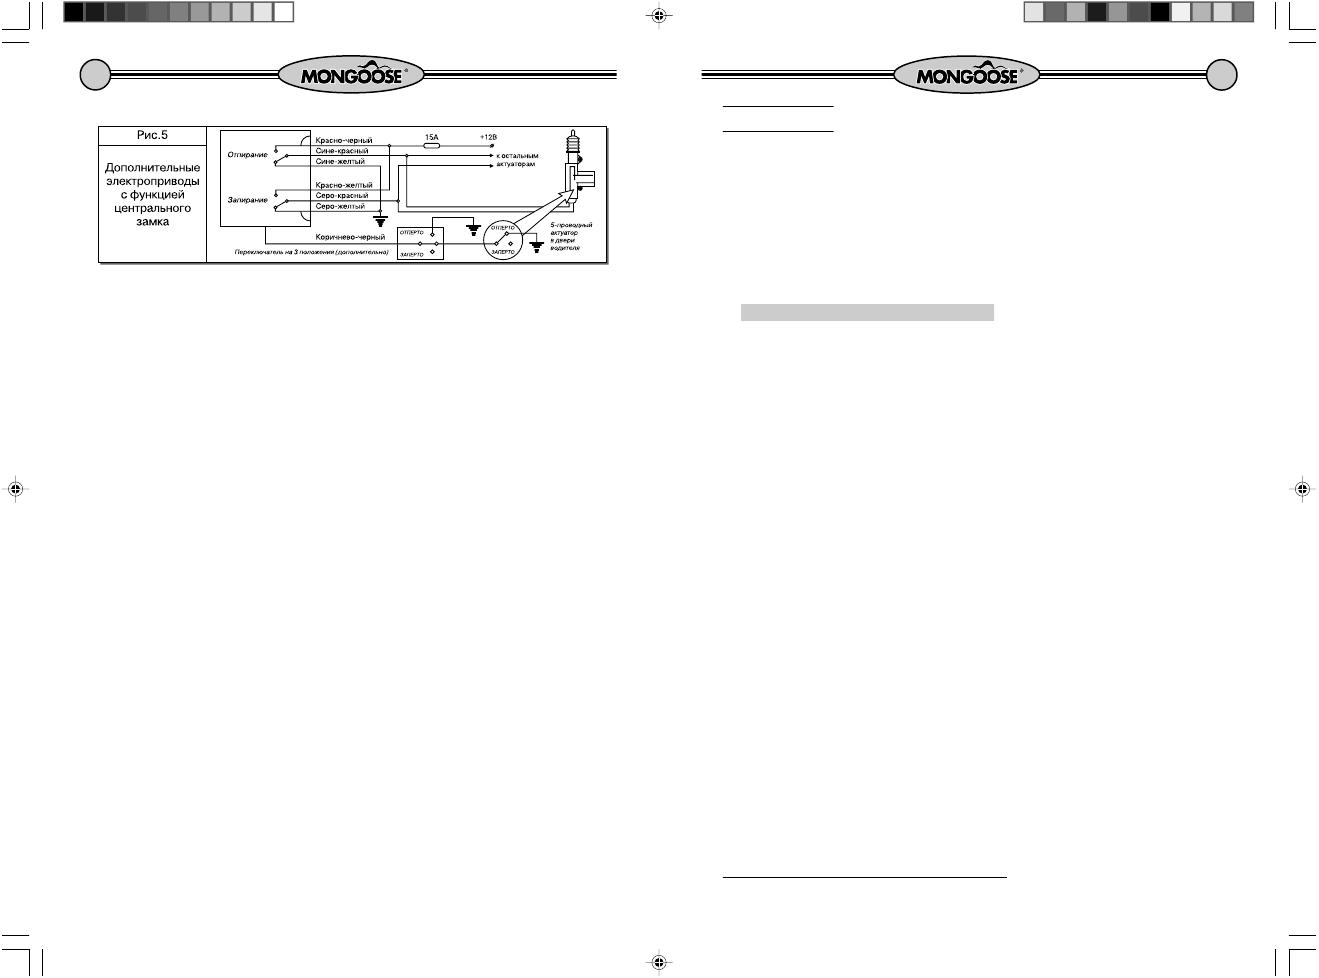 сигнализация мангуст инструкция 3 кнопки